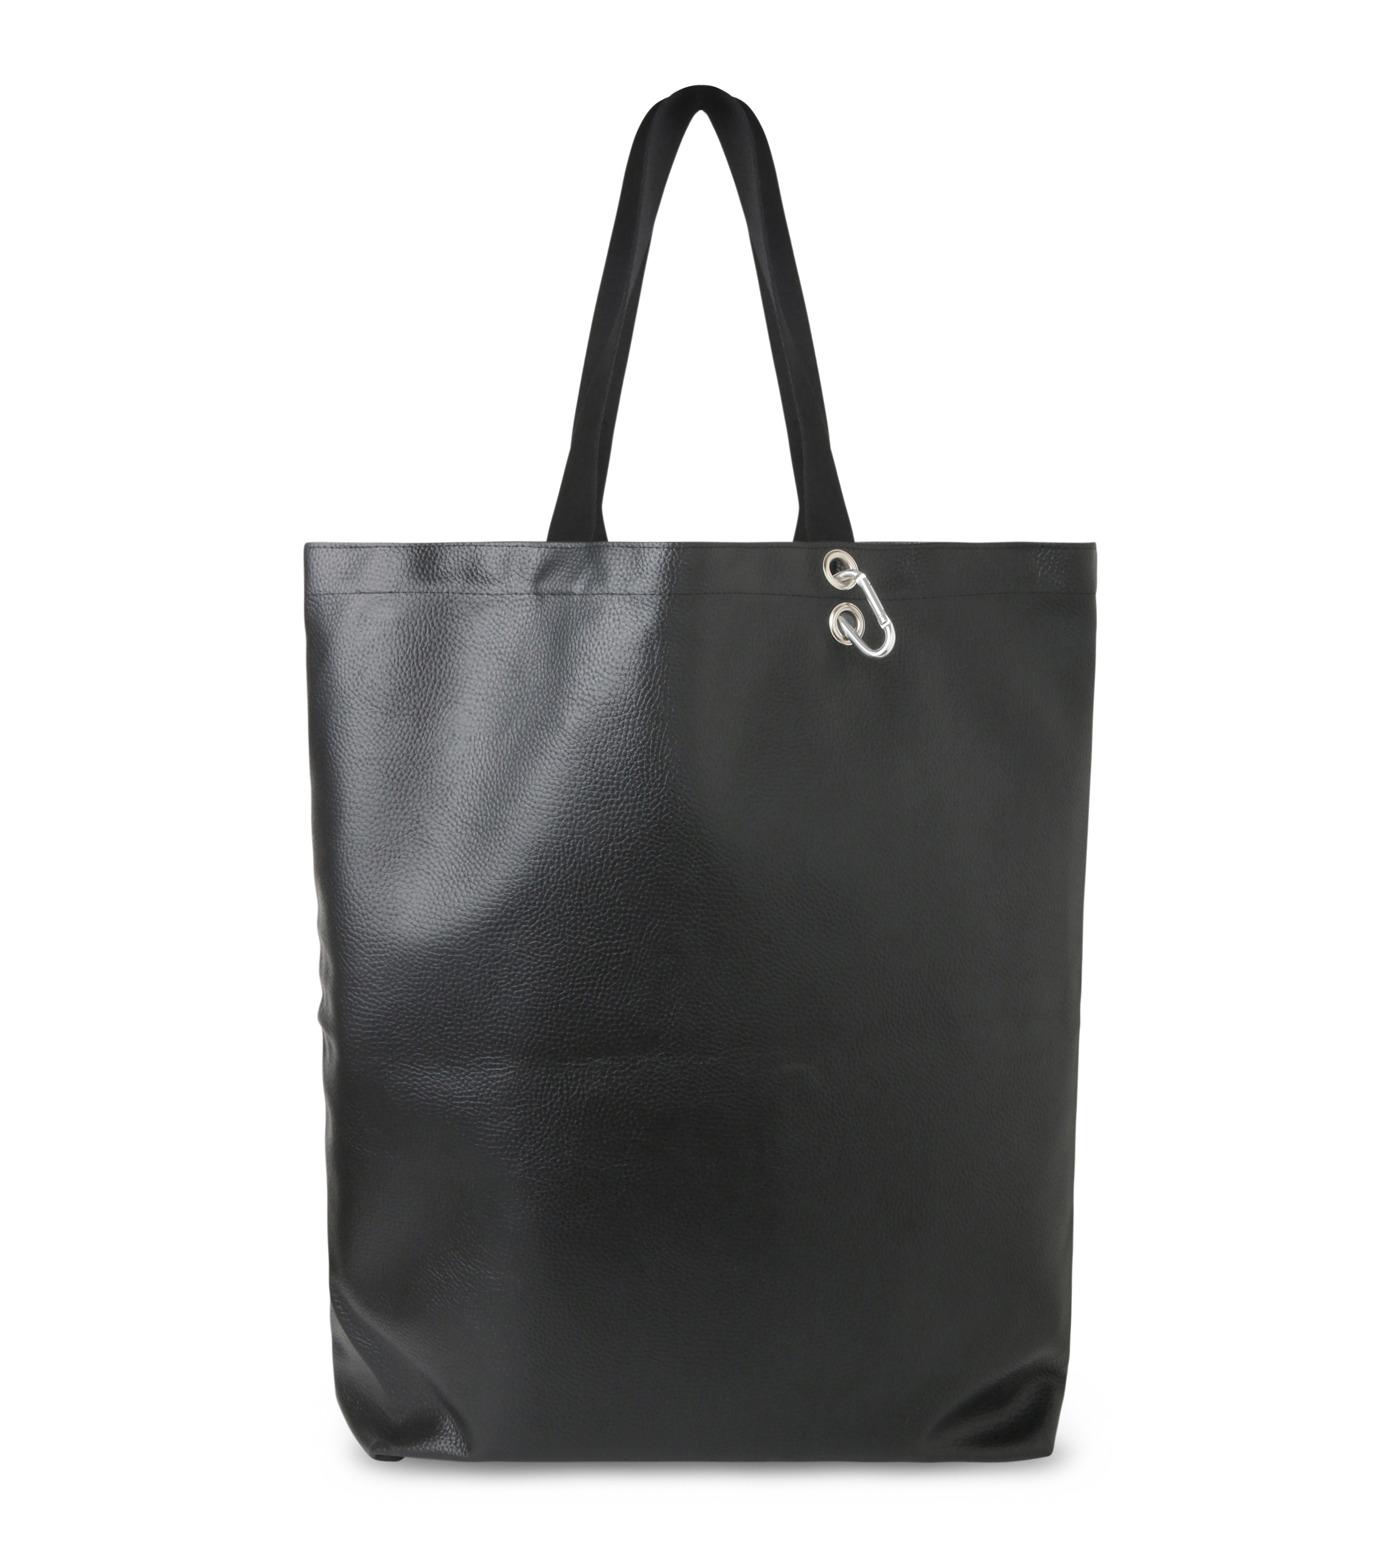 MYne(マイン)のTote Bag-BLACK(ハンドバッグ/hand bag)-MYA8-0008-13 拡大詳細画像1